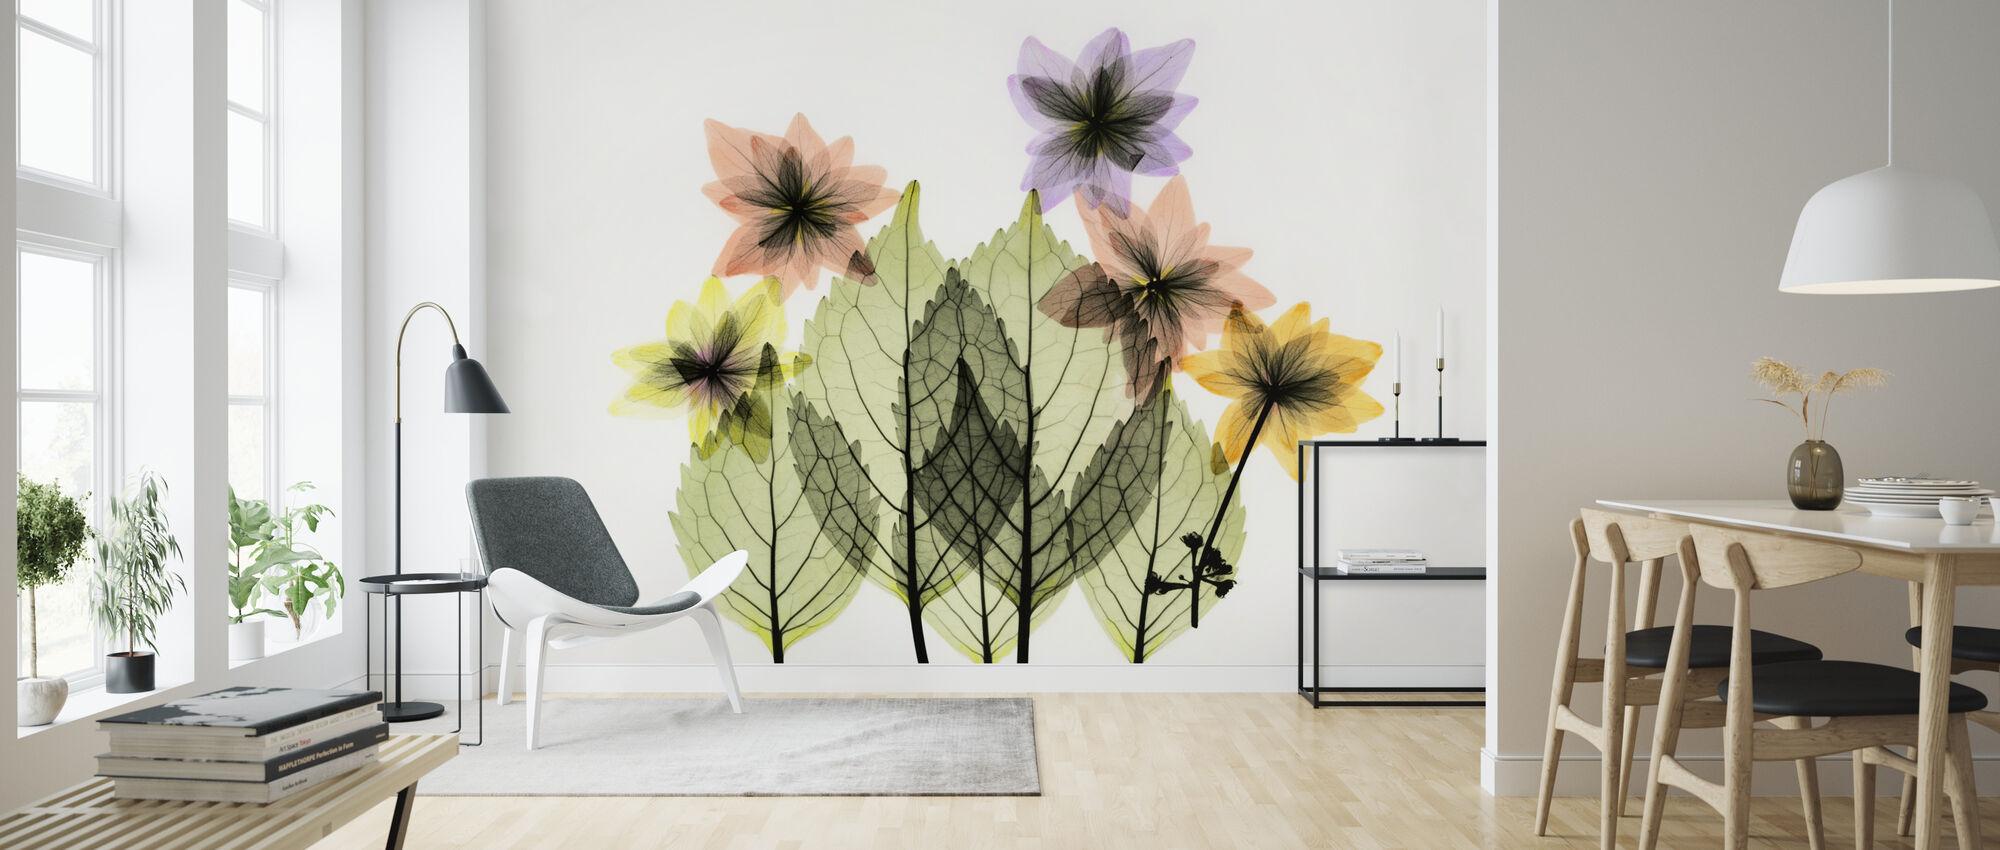 Shooting Star - Wallpaper - Living Room